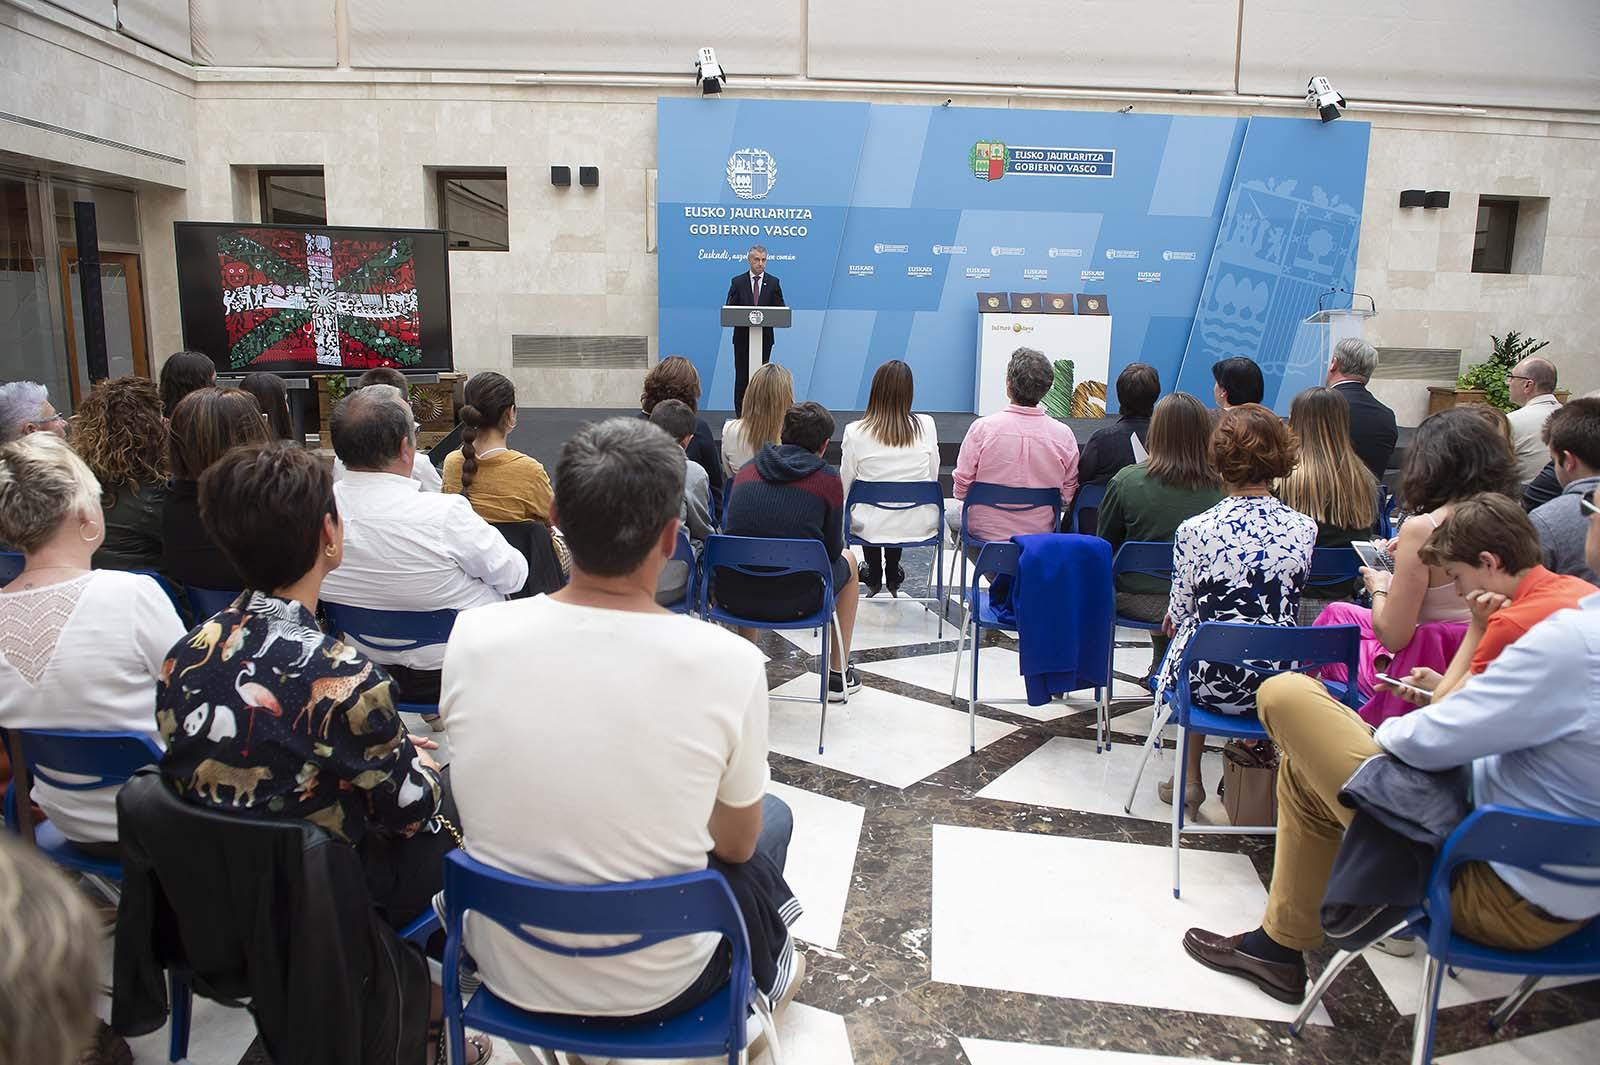 Kultura Ondarea Saria 2019 entrega de premios